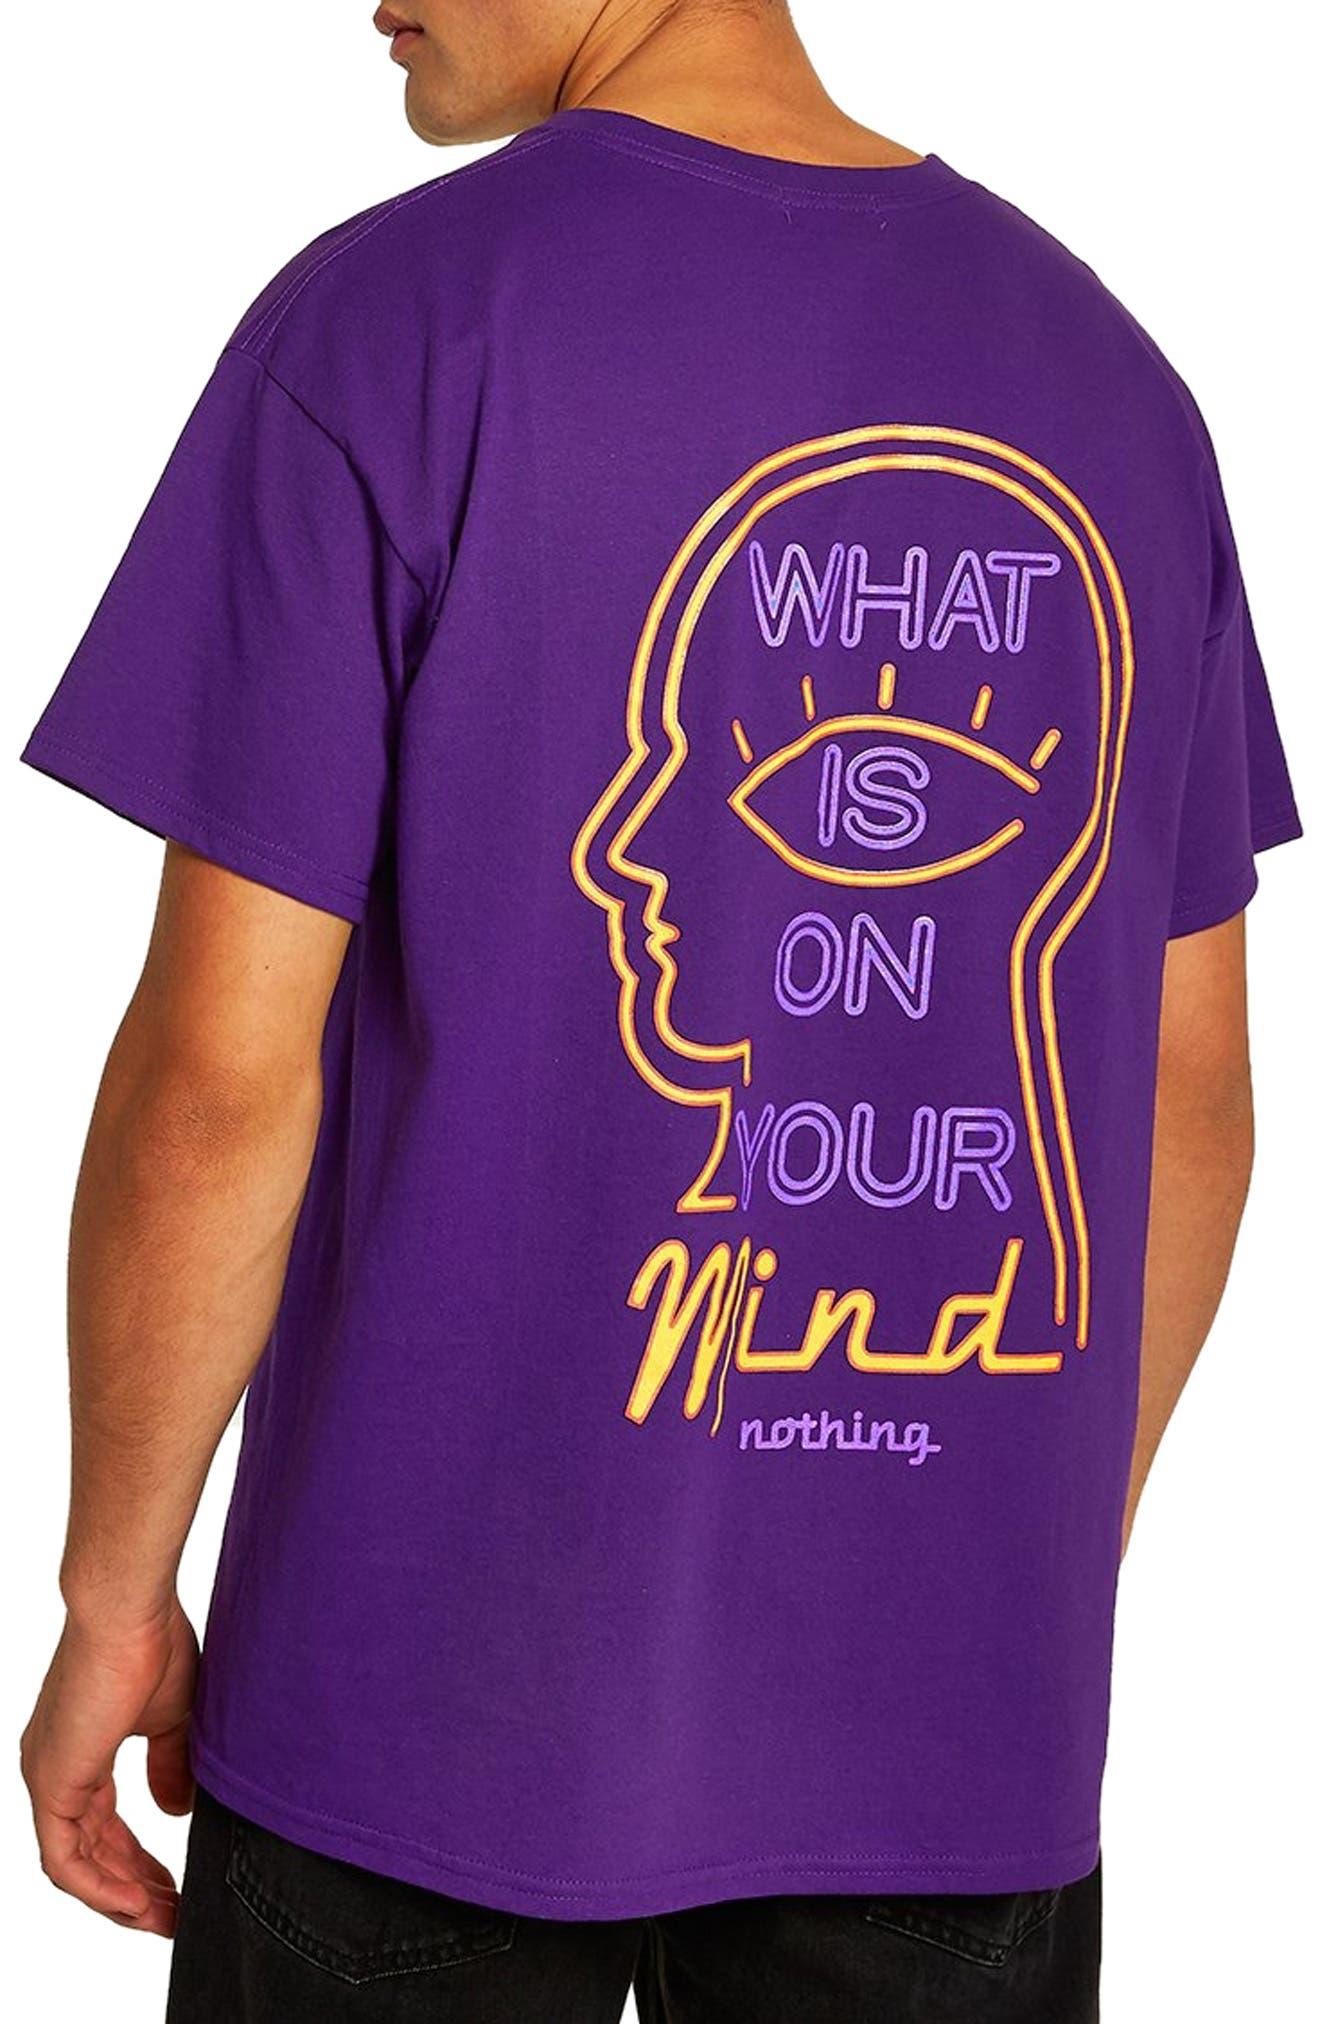 On Your Mind Graphic T-Shirt,                             Alternate thumbnail 2, color,                             PURPLE MULTI